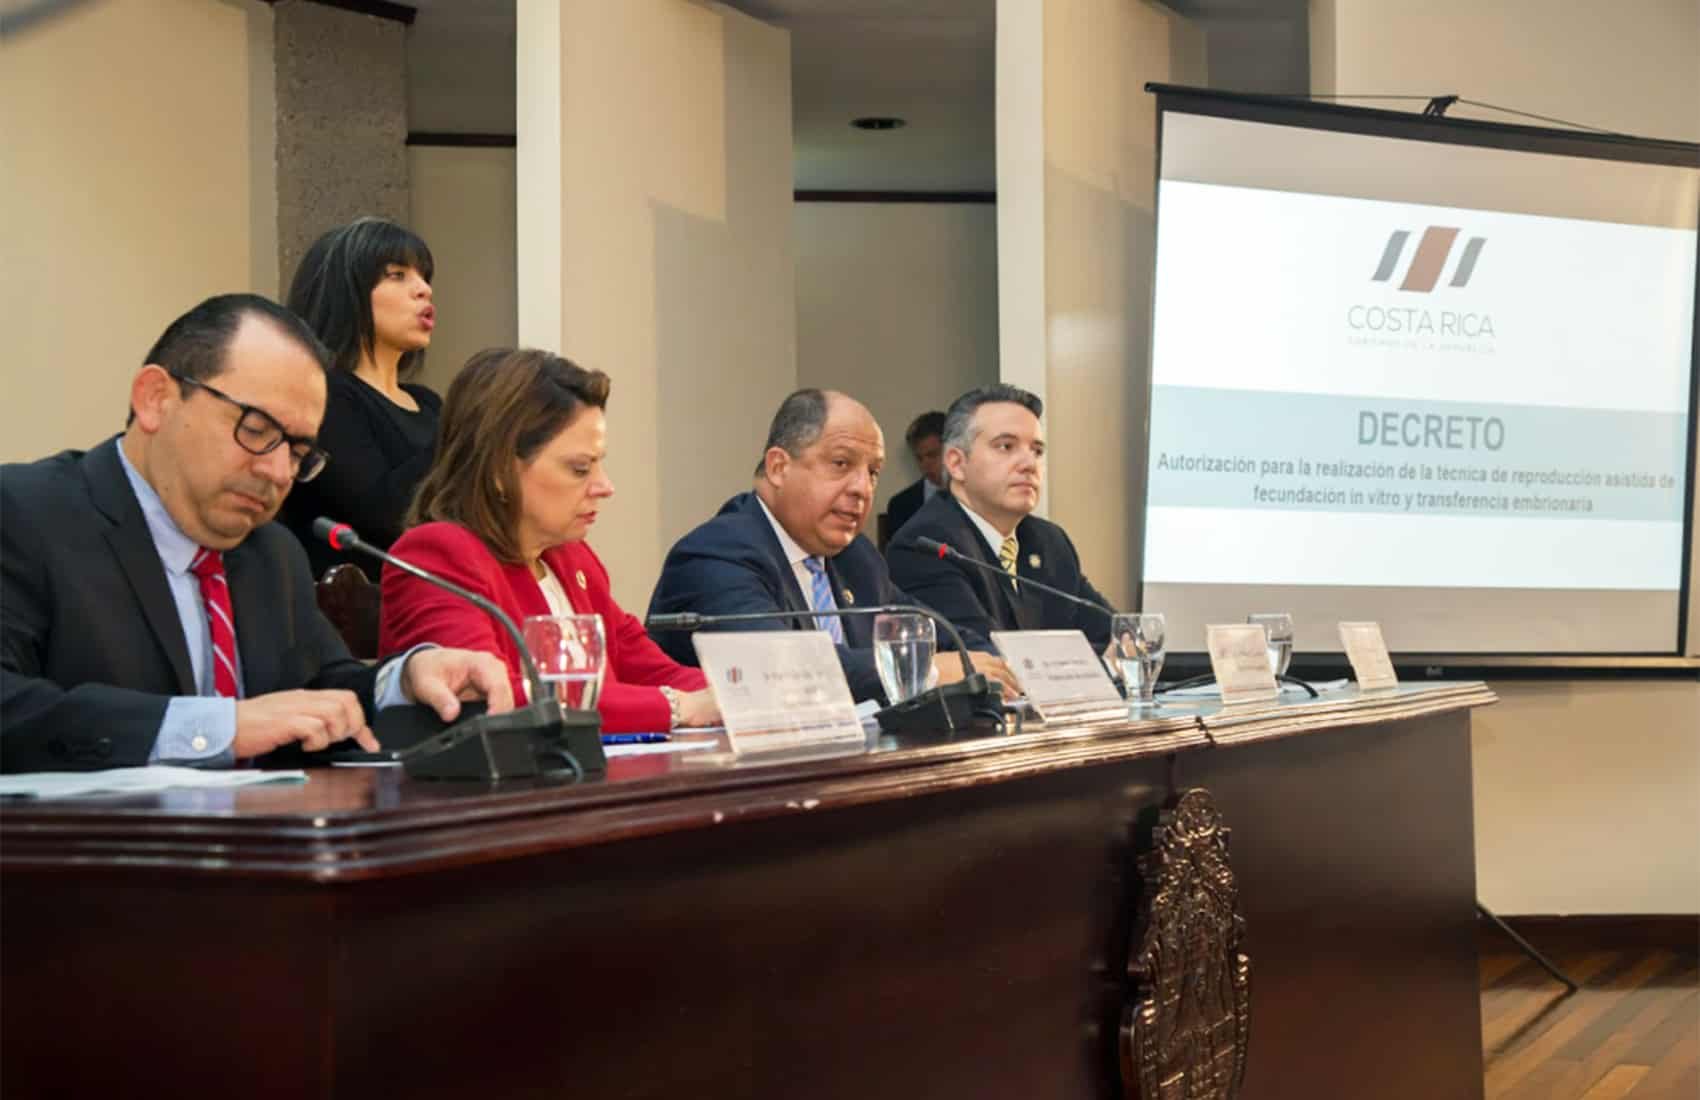 IVF Costa Rica executive decree announcement